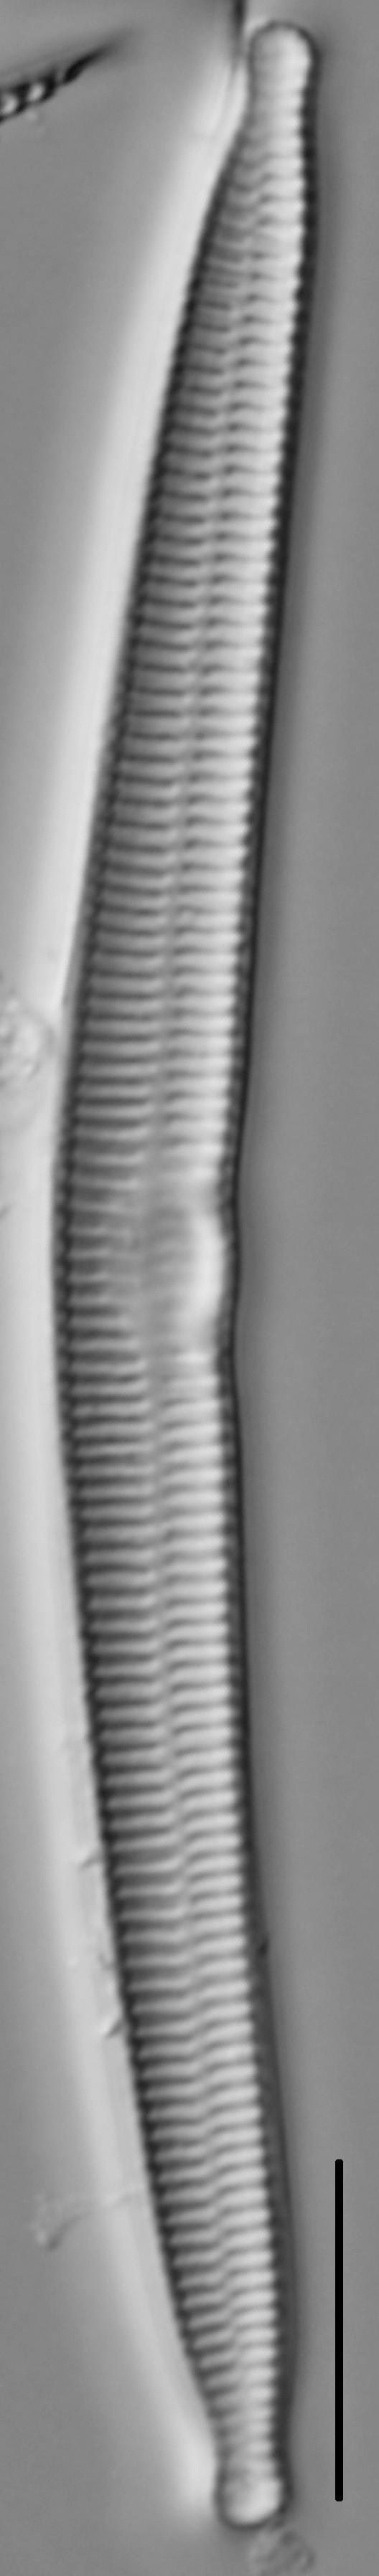 Hannaea arcus LM1